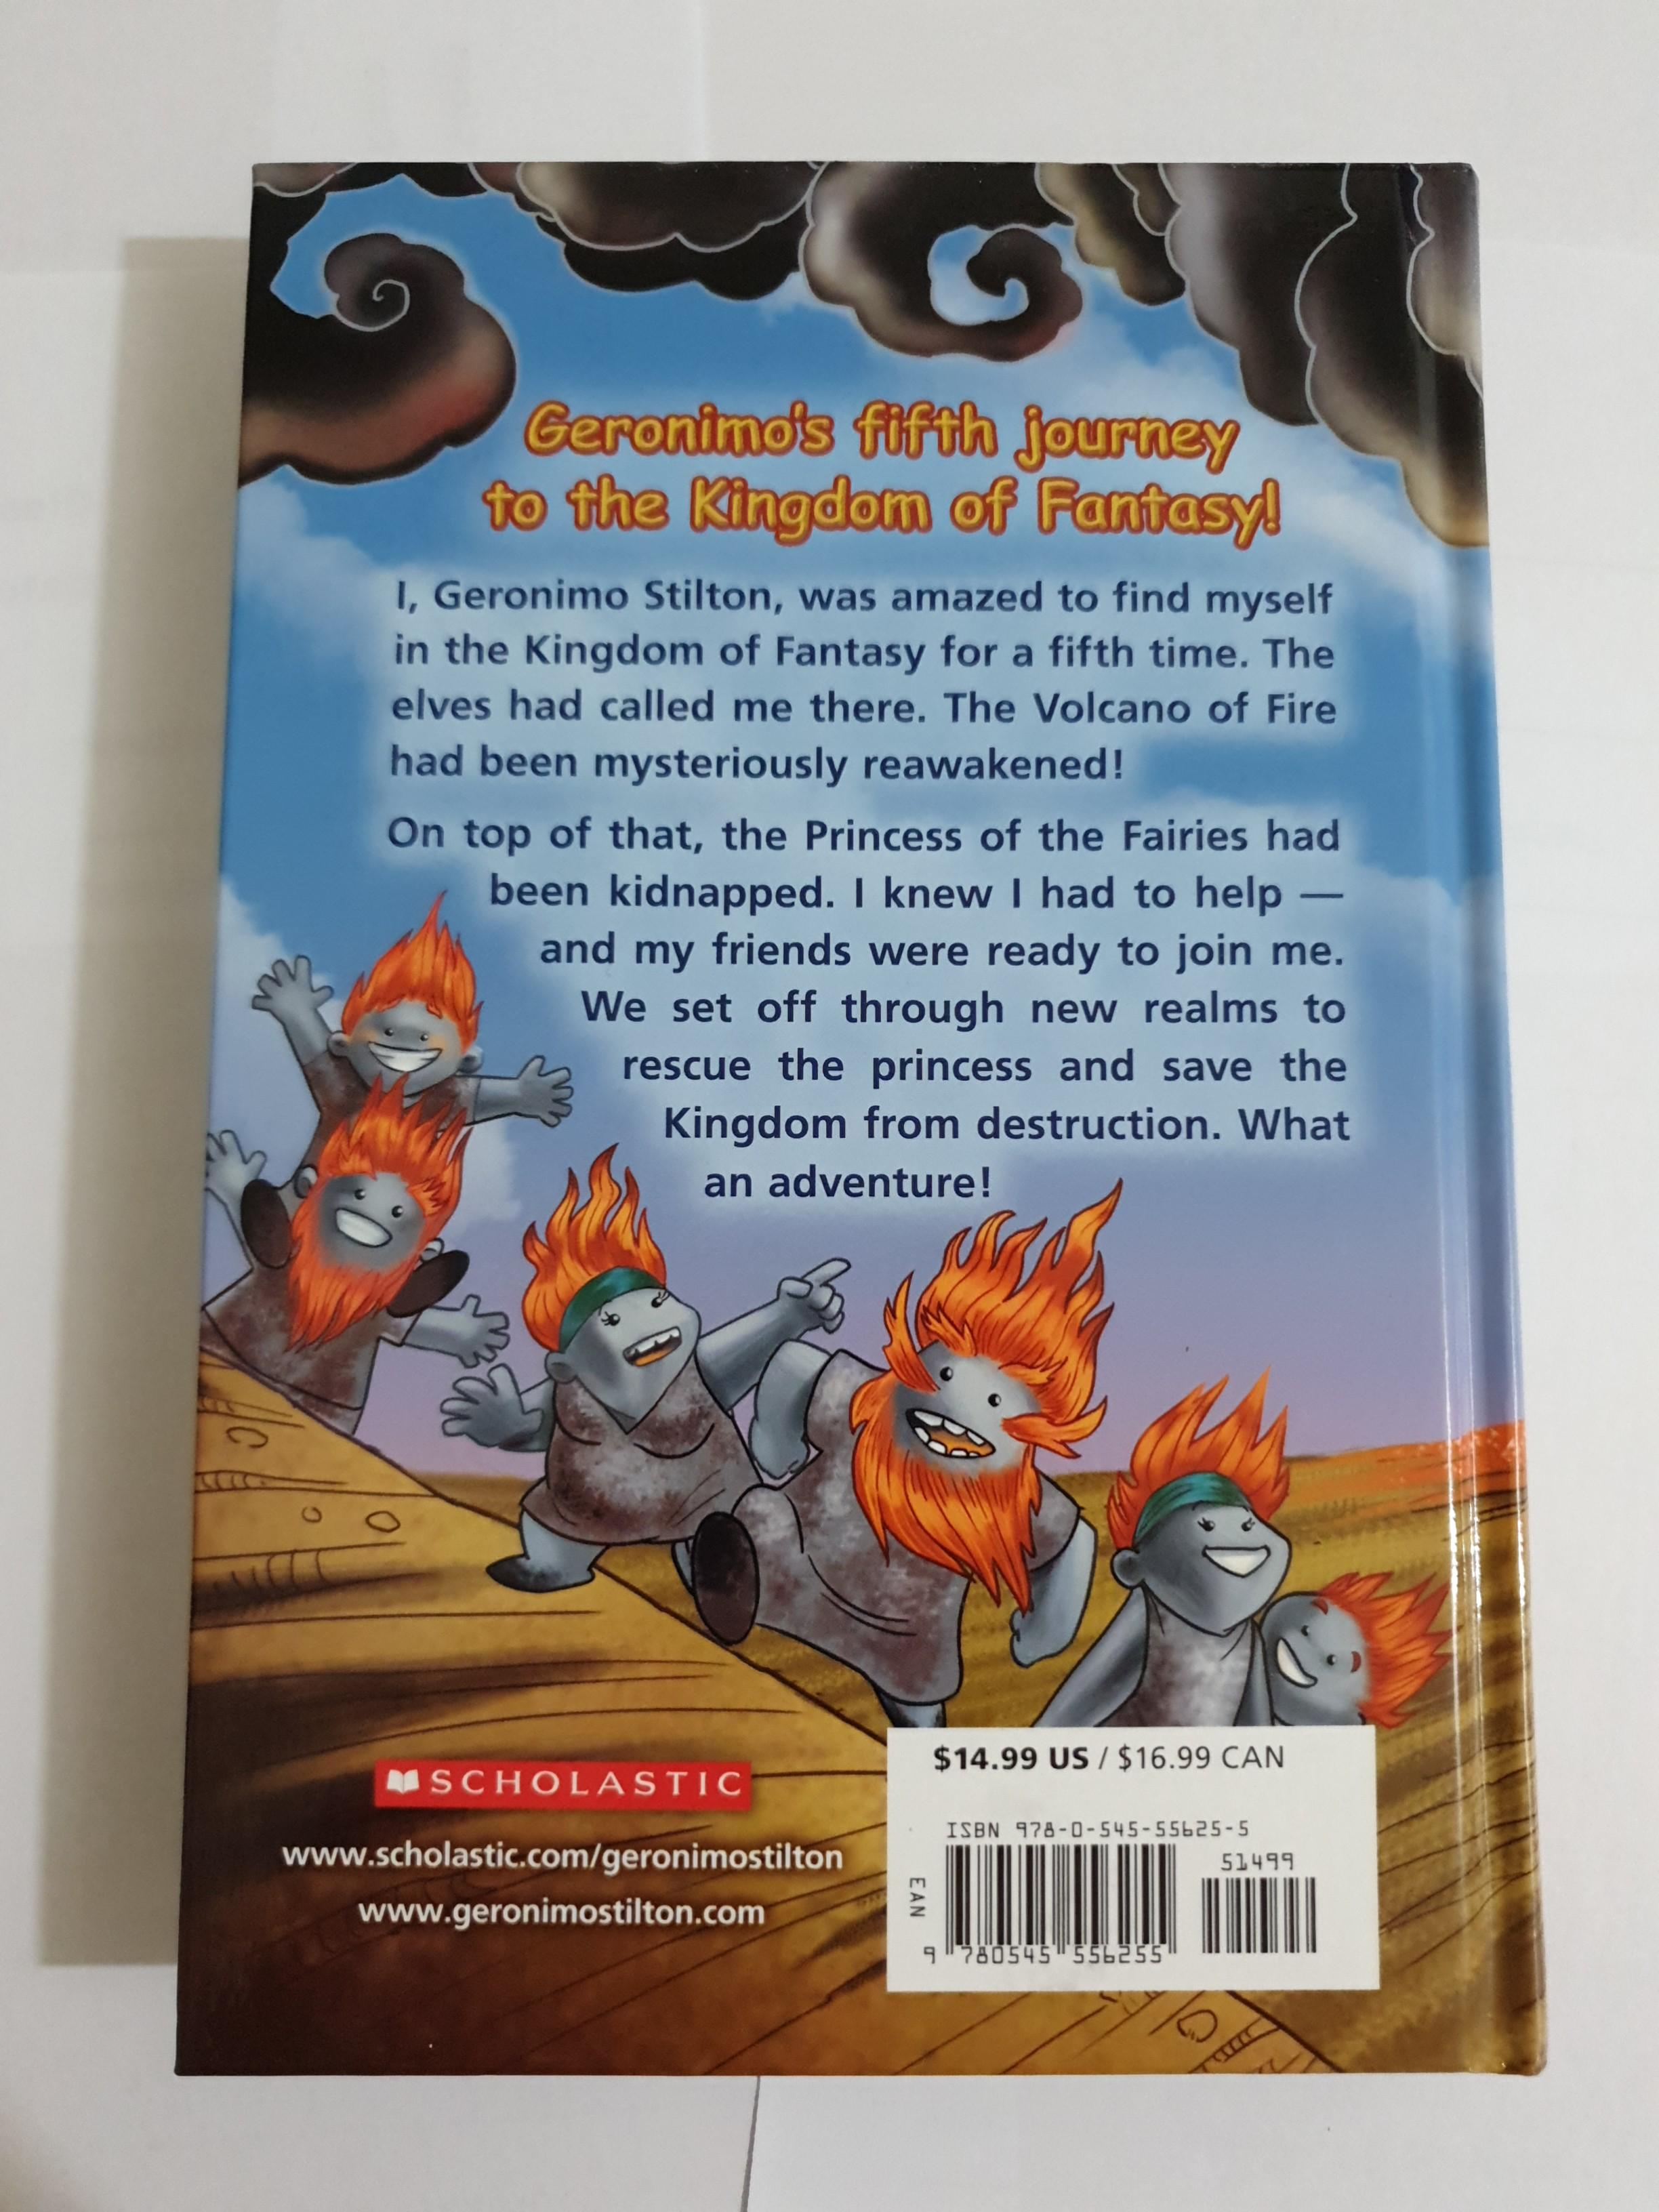 Geronimo Stilton Original (Hardcover)